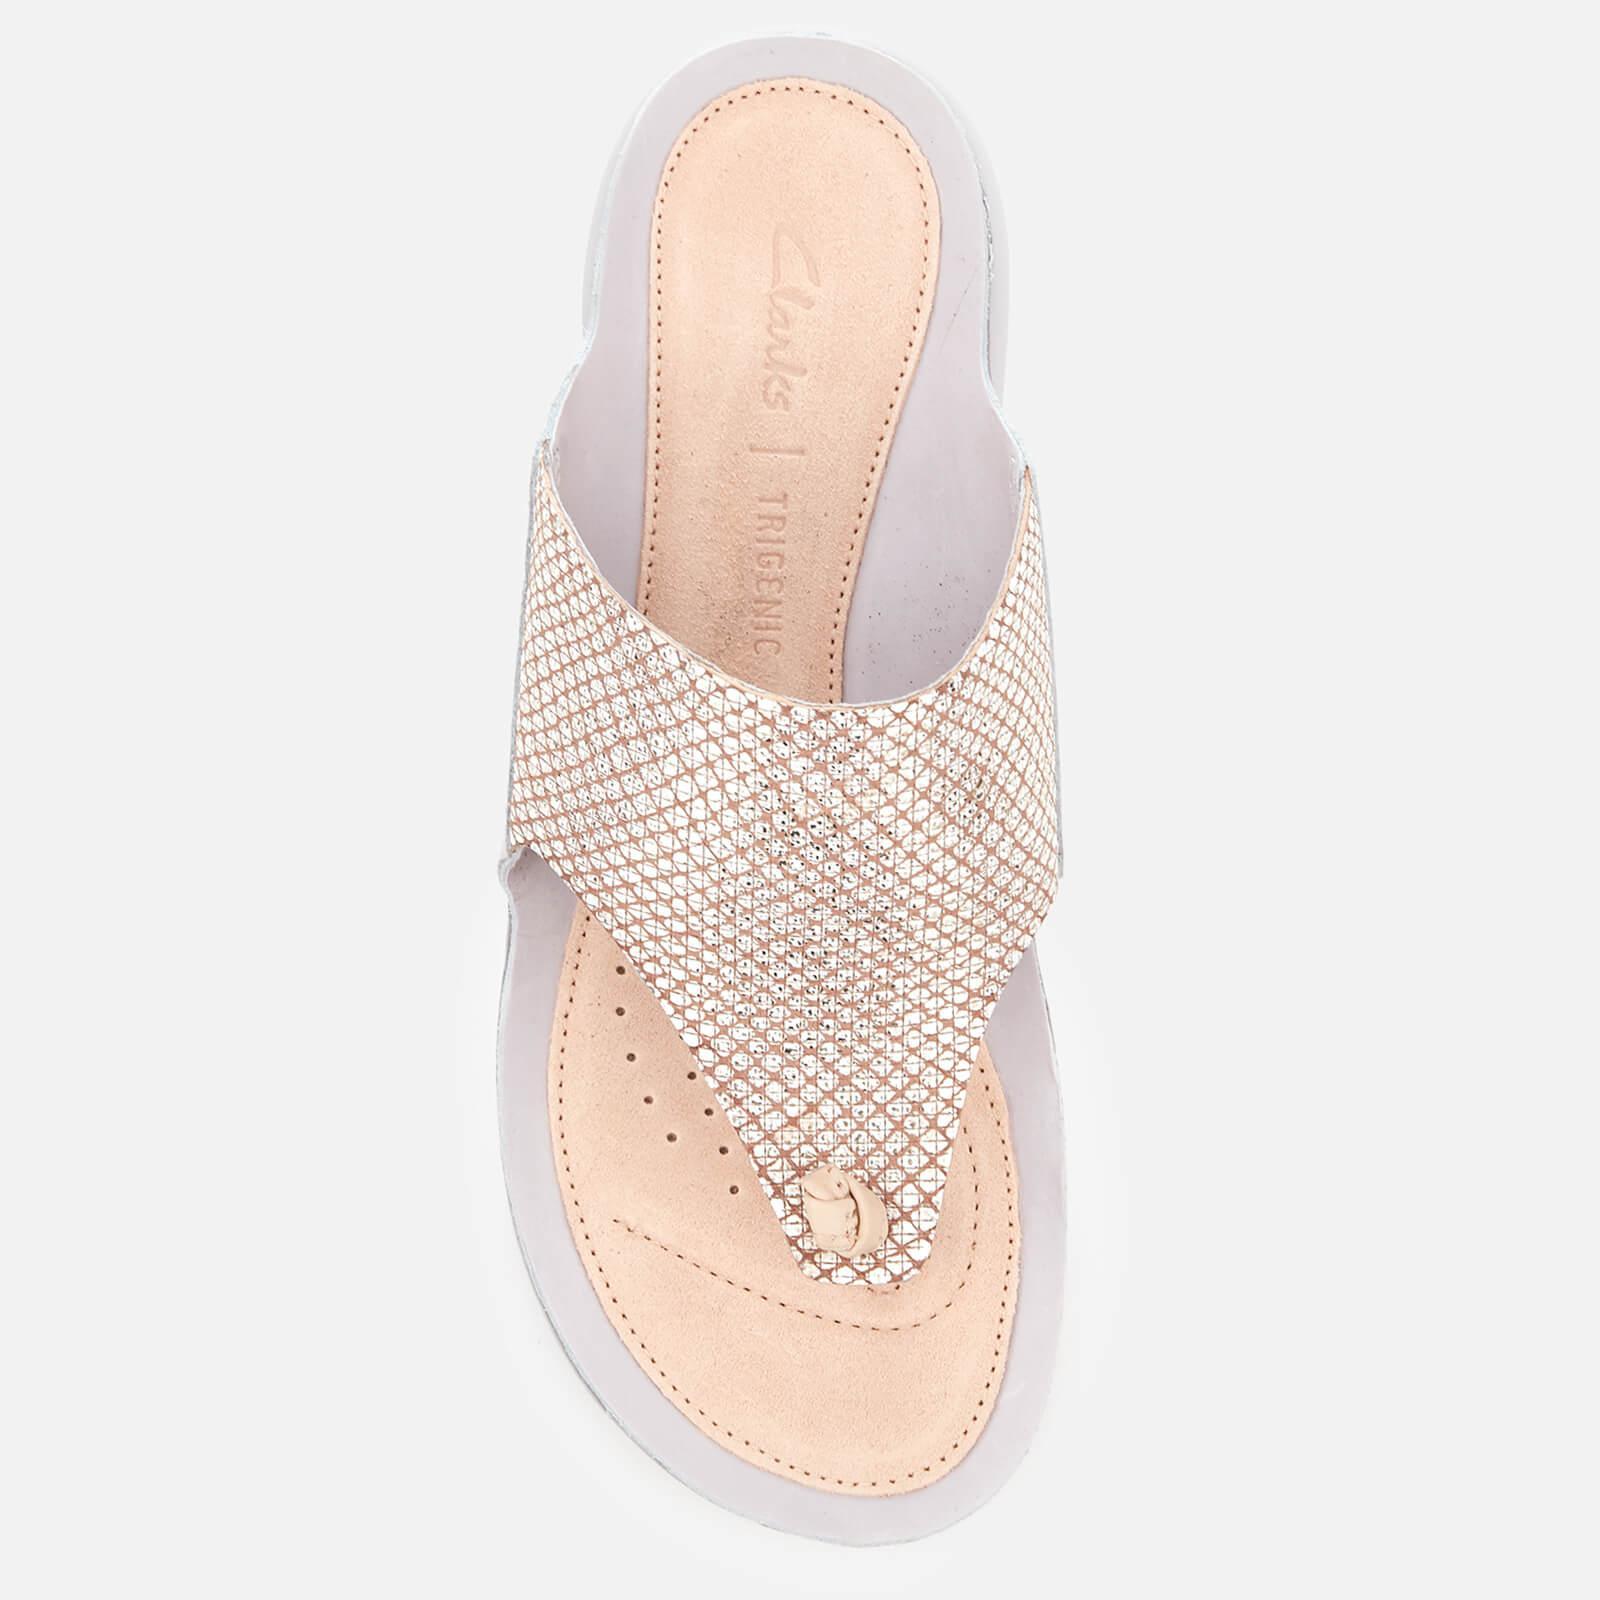 1c676fc2d4c7 Lyst - Clarks Tri Carmen Toe Post Sandals in Metallic